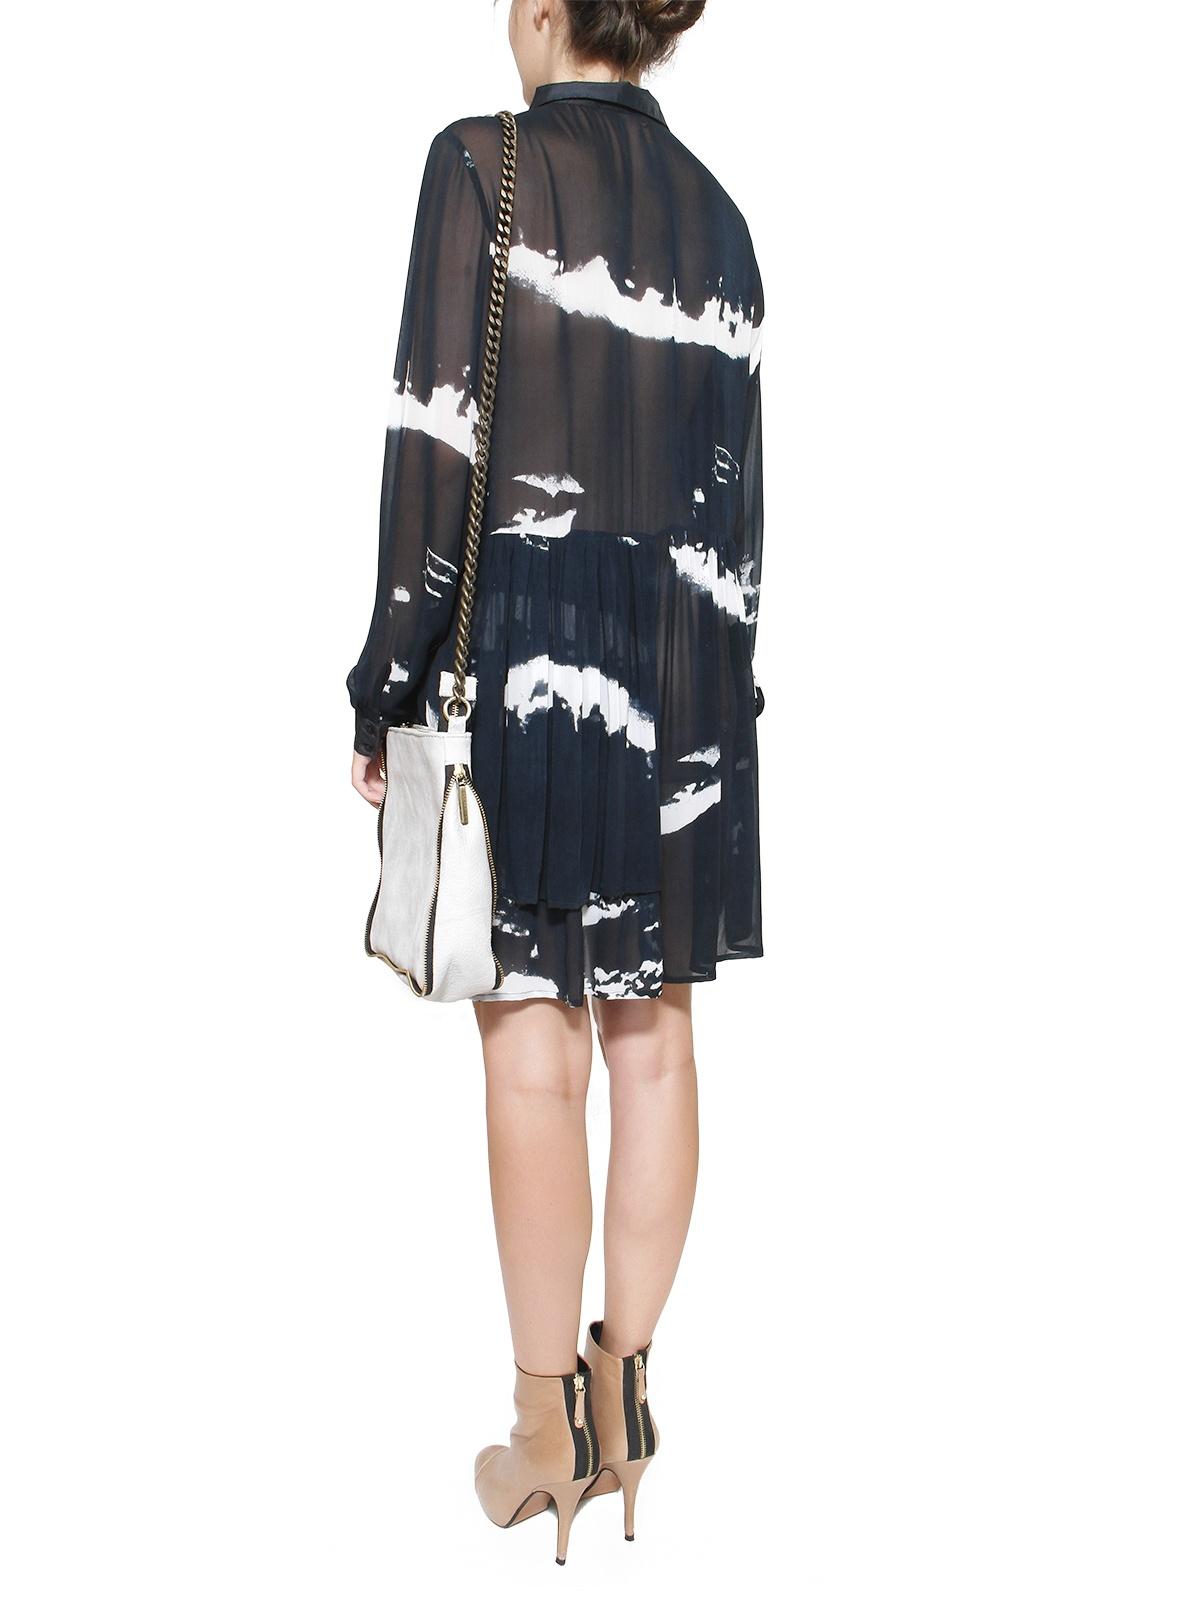 MELIS PRINT DRESS | GIRISSIMA.COM - Collectible fashion to love and to last